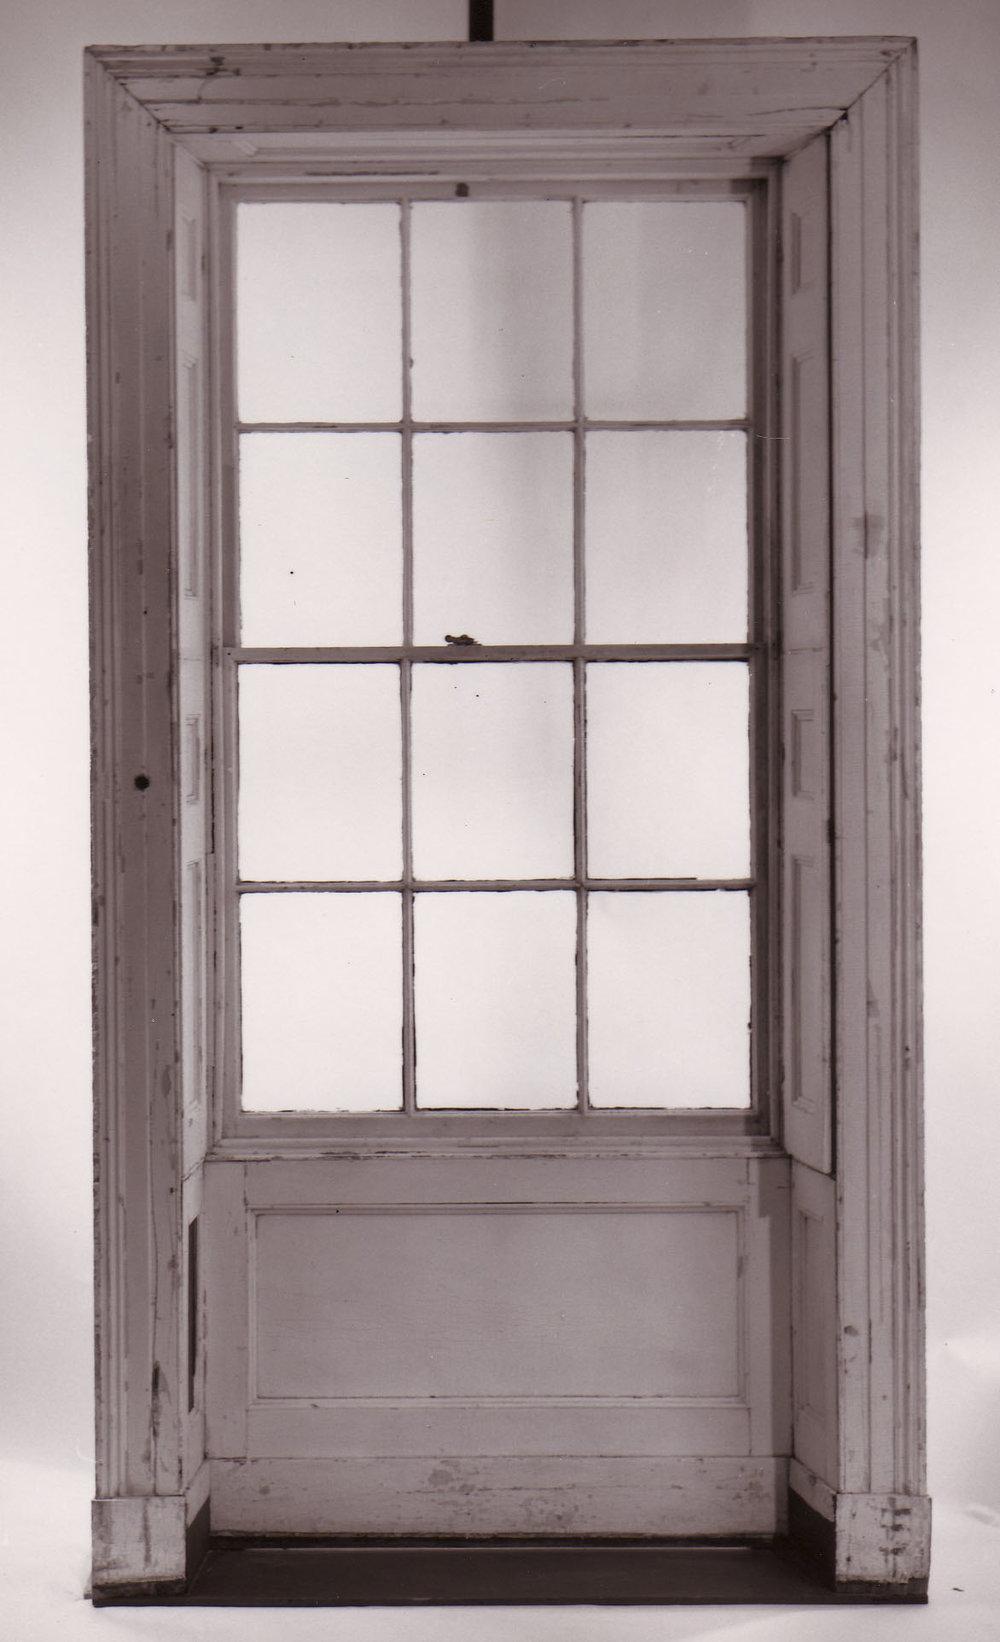 1820s Concealed Interior Window Shutter